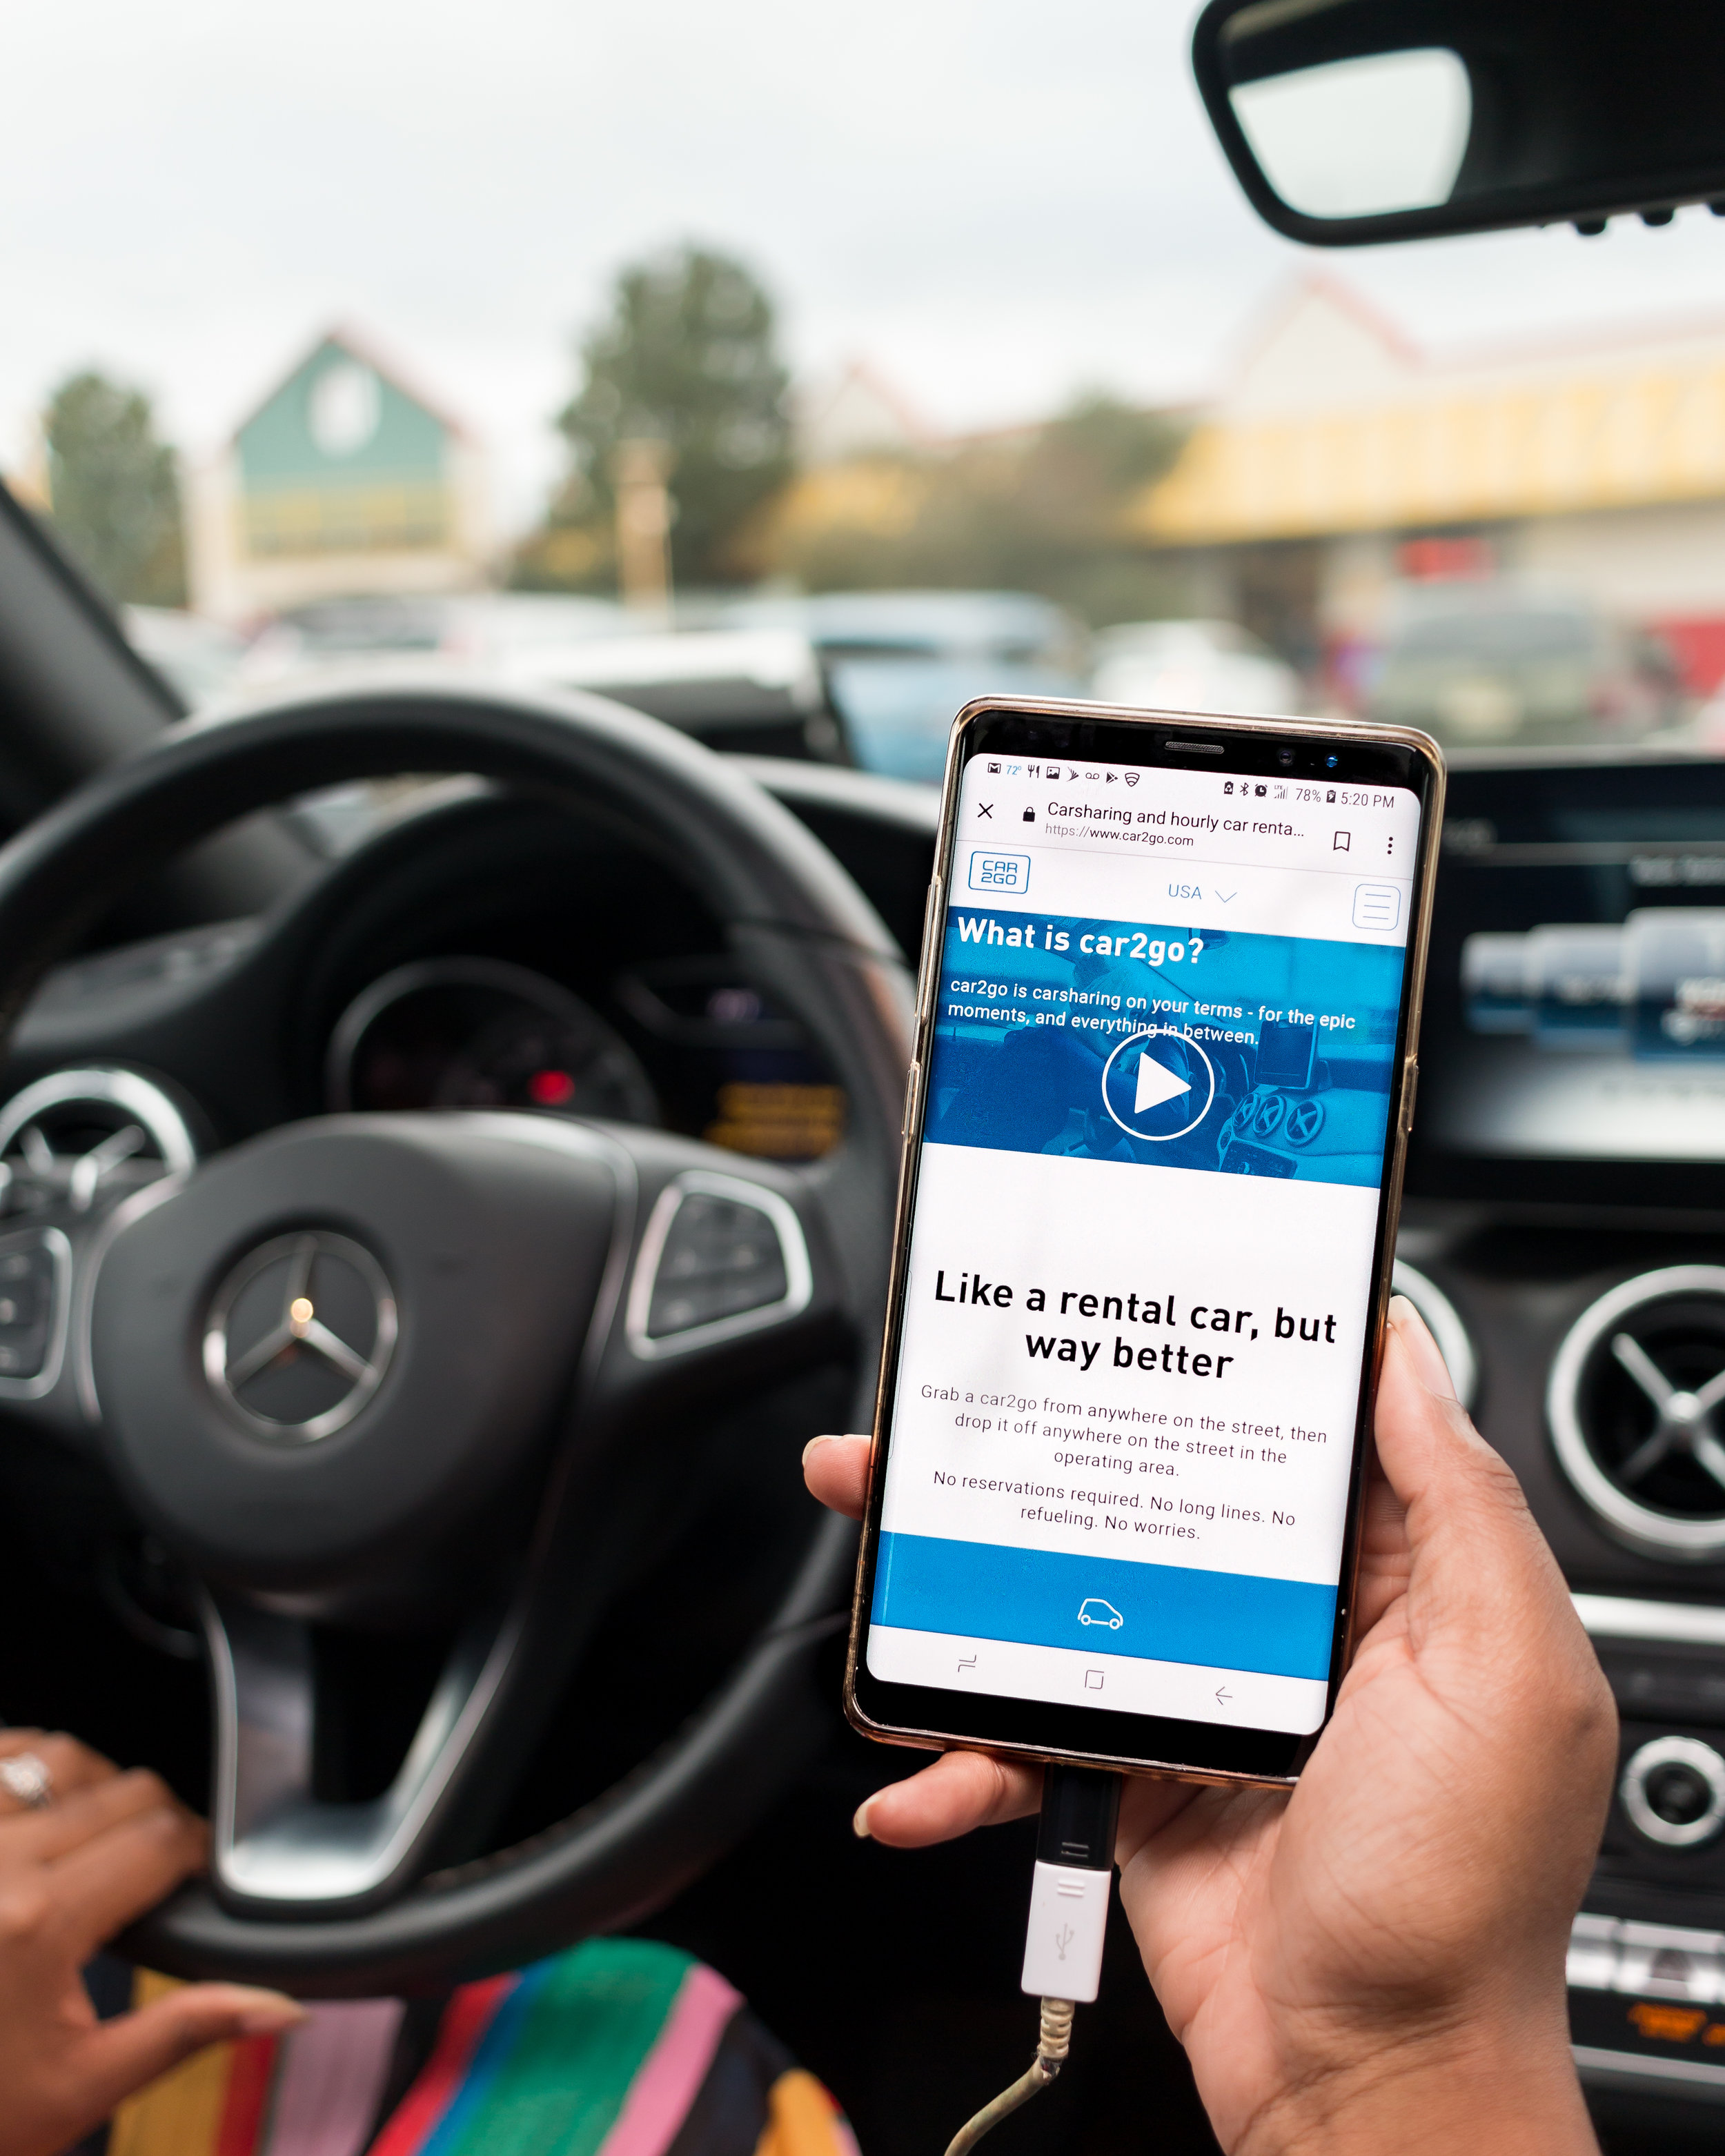 eas-in-app-car-rental-with-car2go-membership